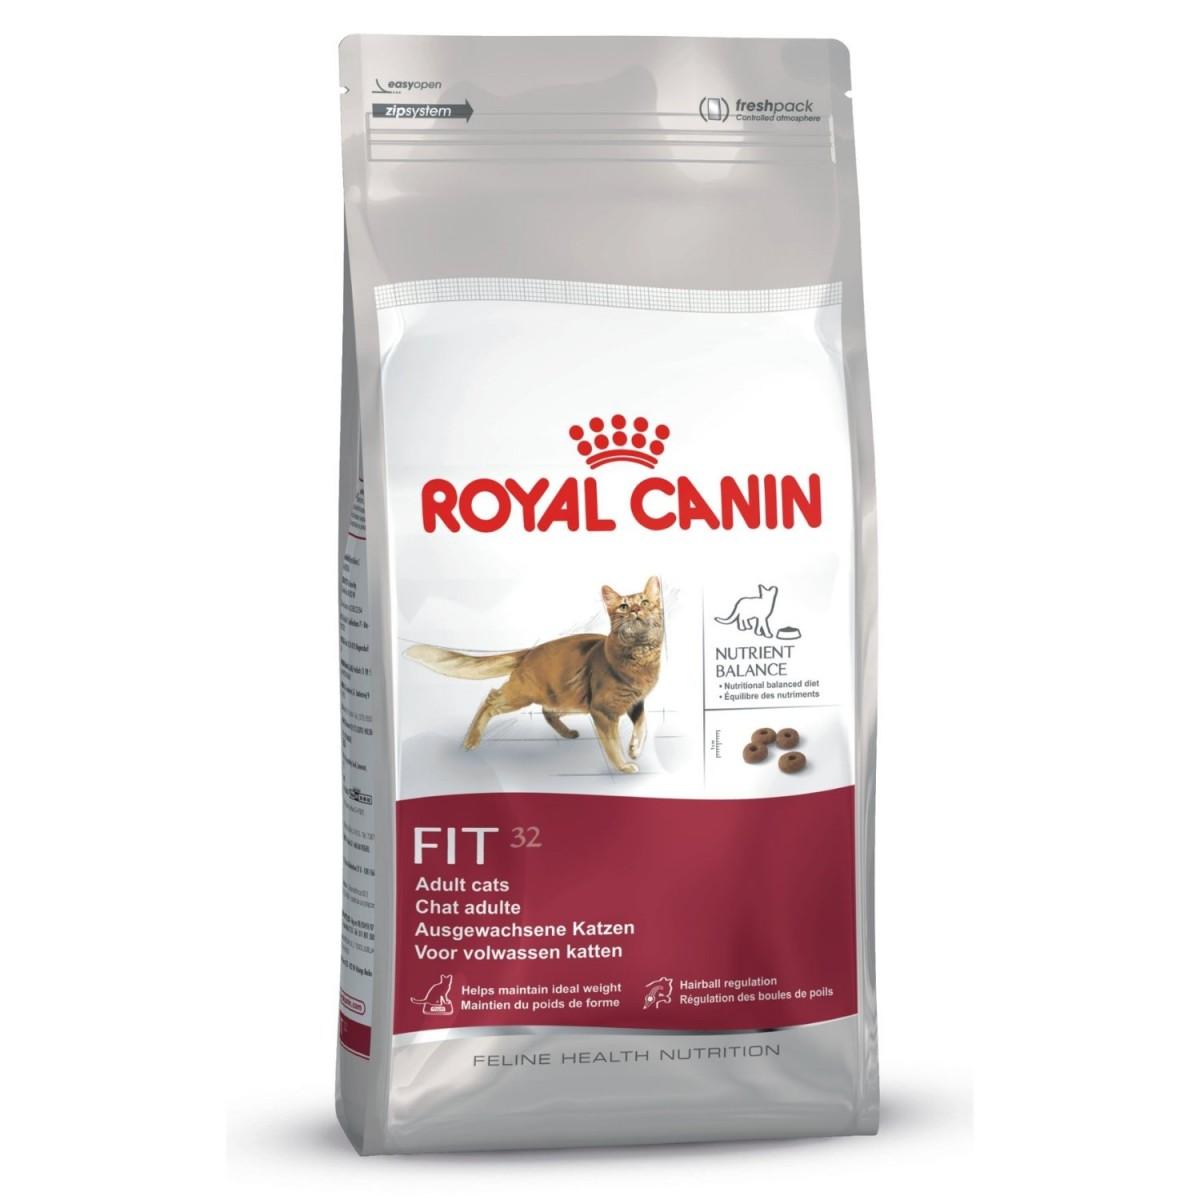 Royal Canin Fit 32 | 2kg Katzenfutter ruhige Hauskatzen